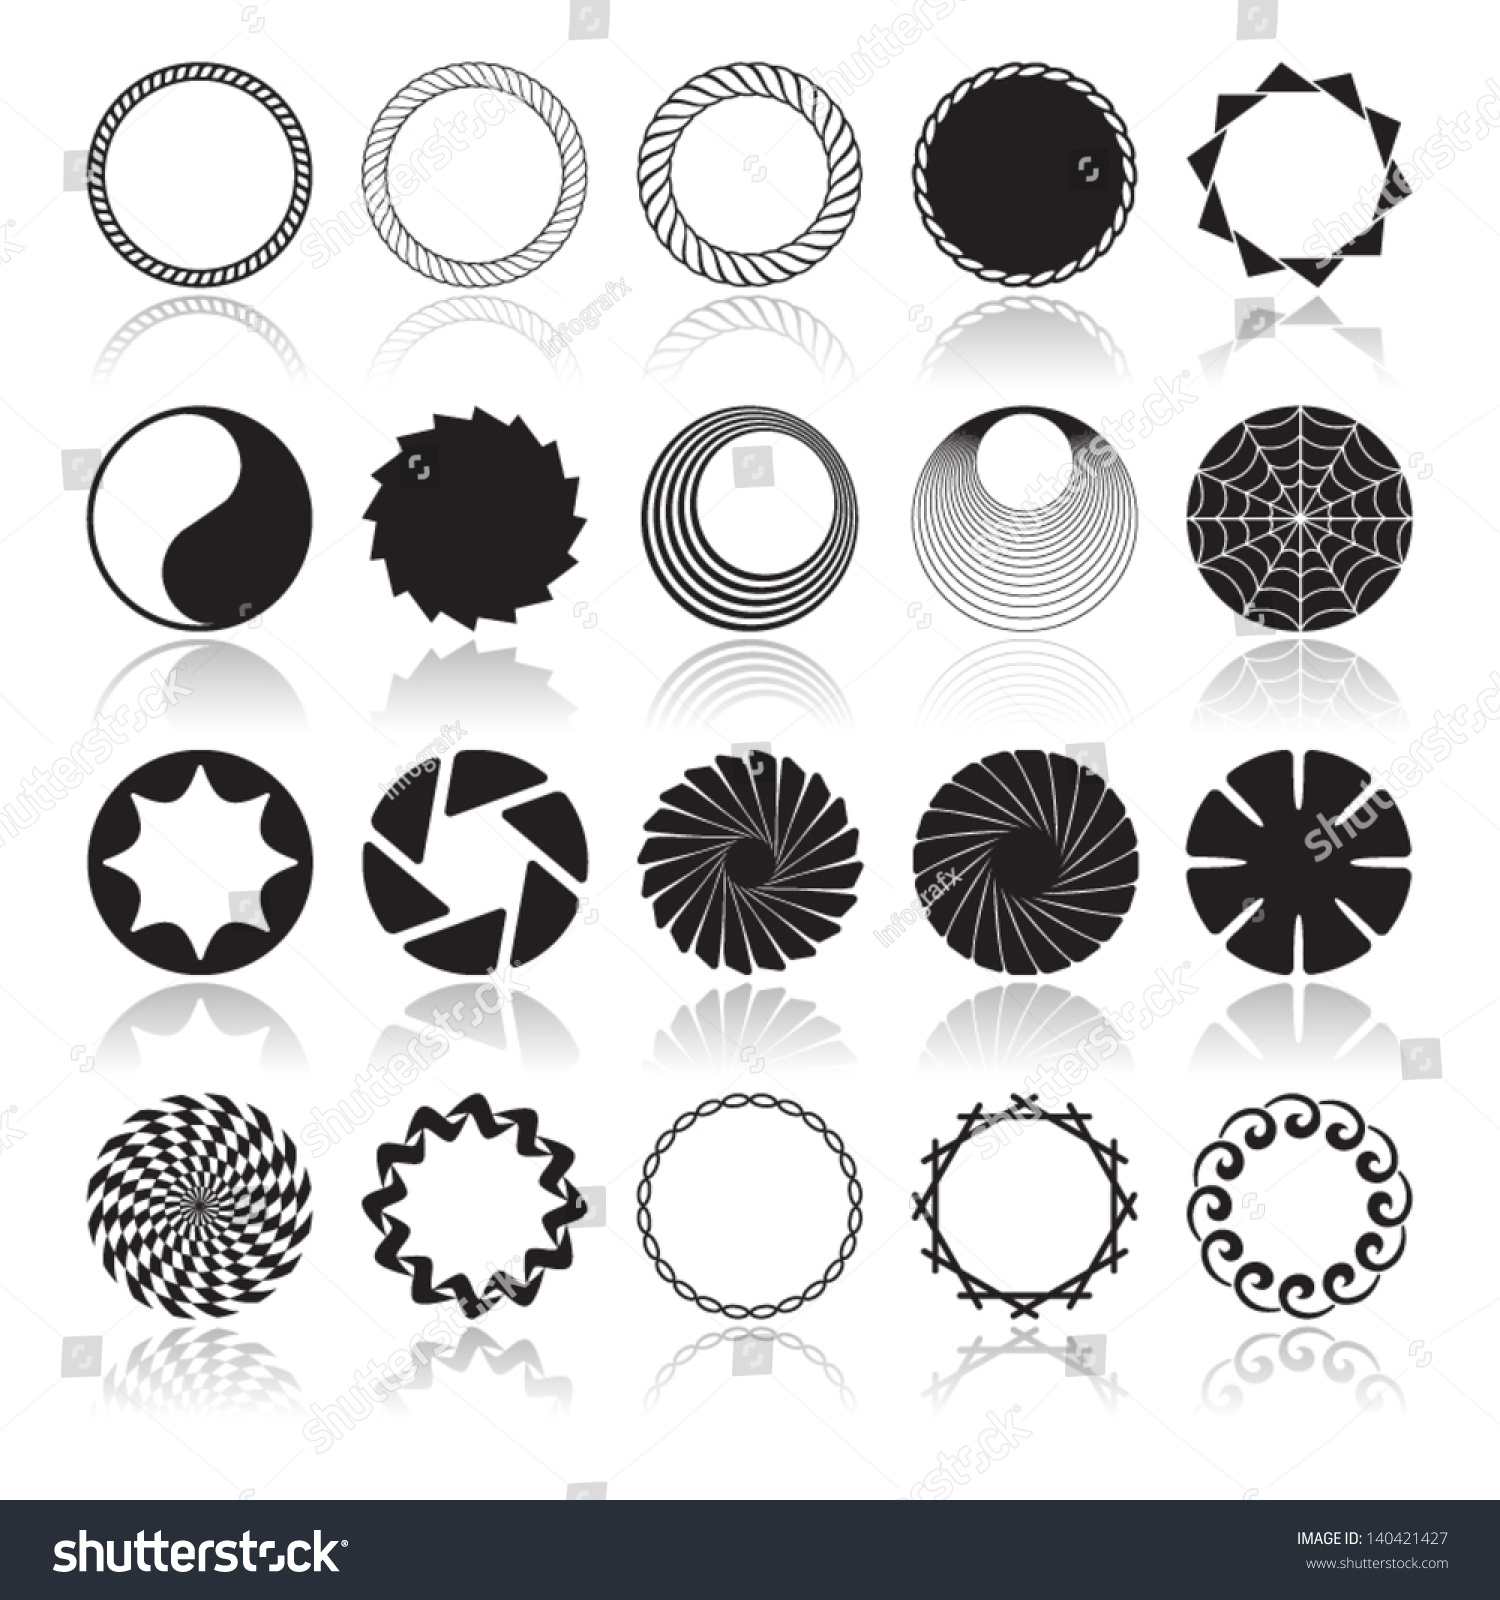 abstract design circle sector - photo #39